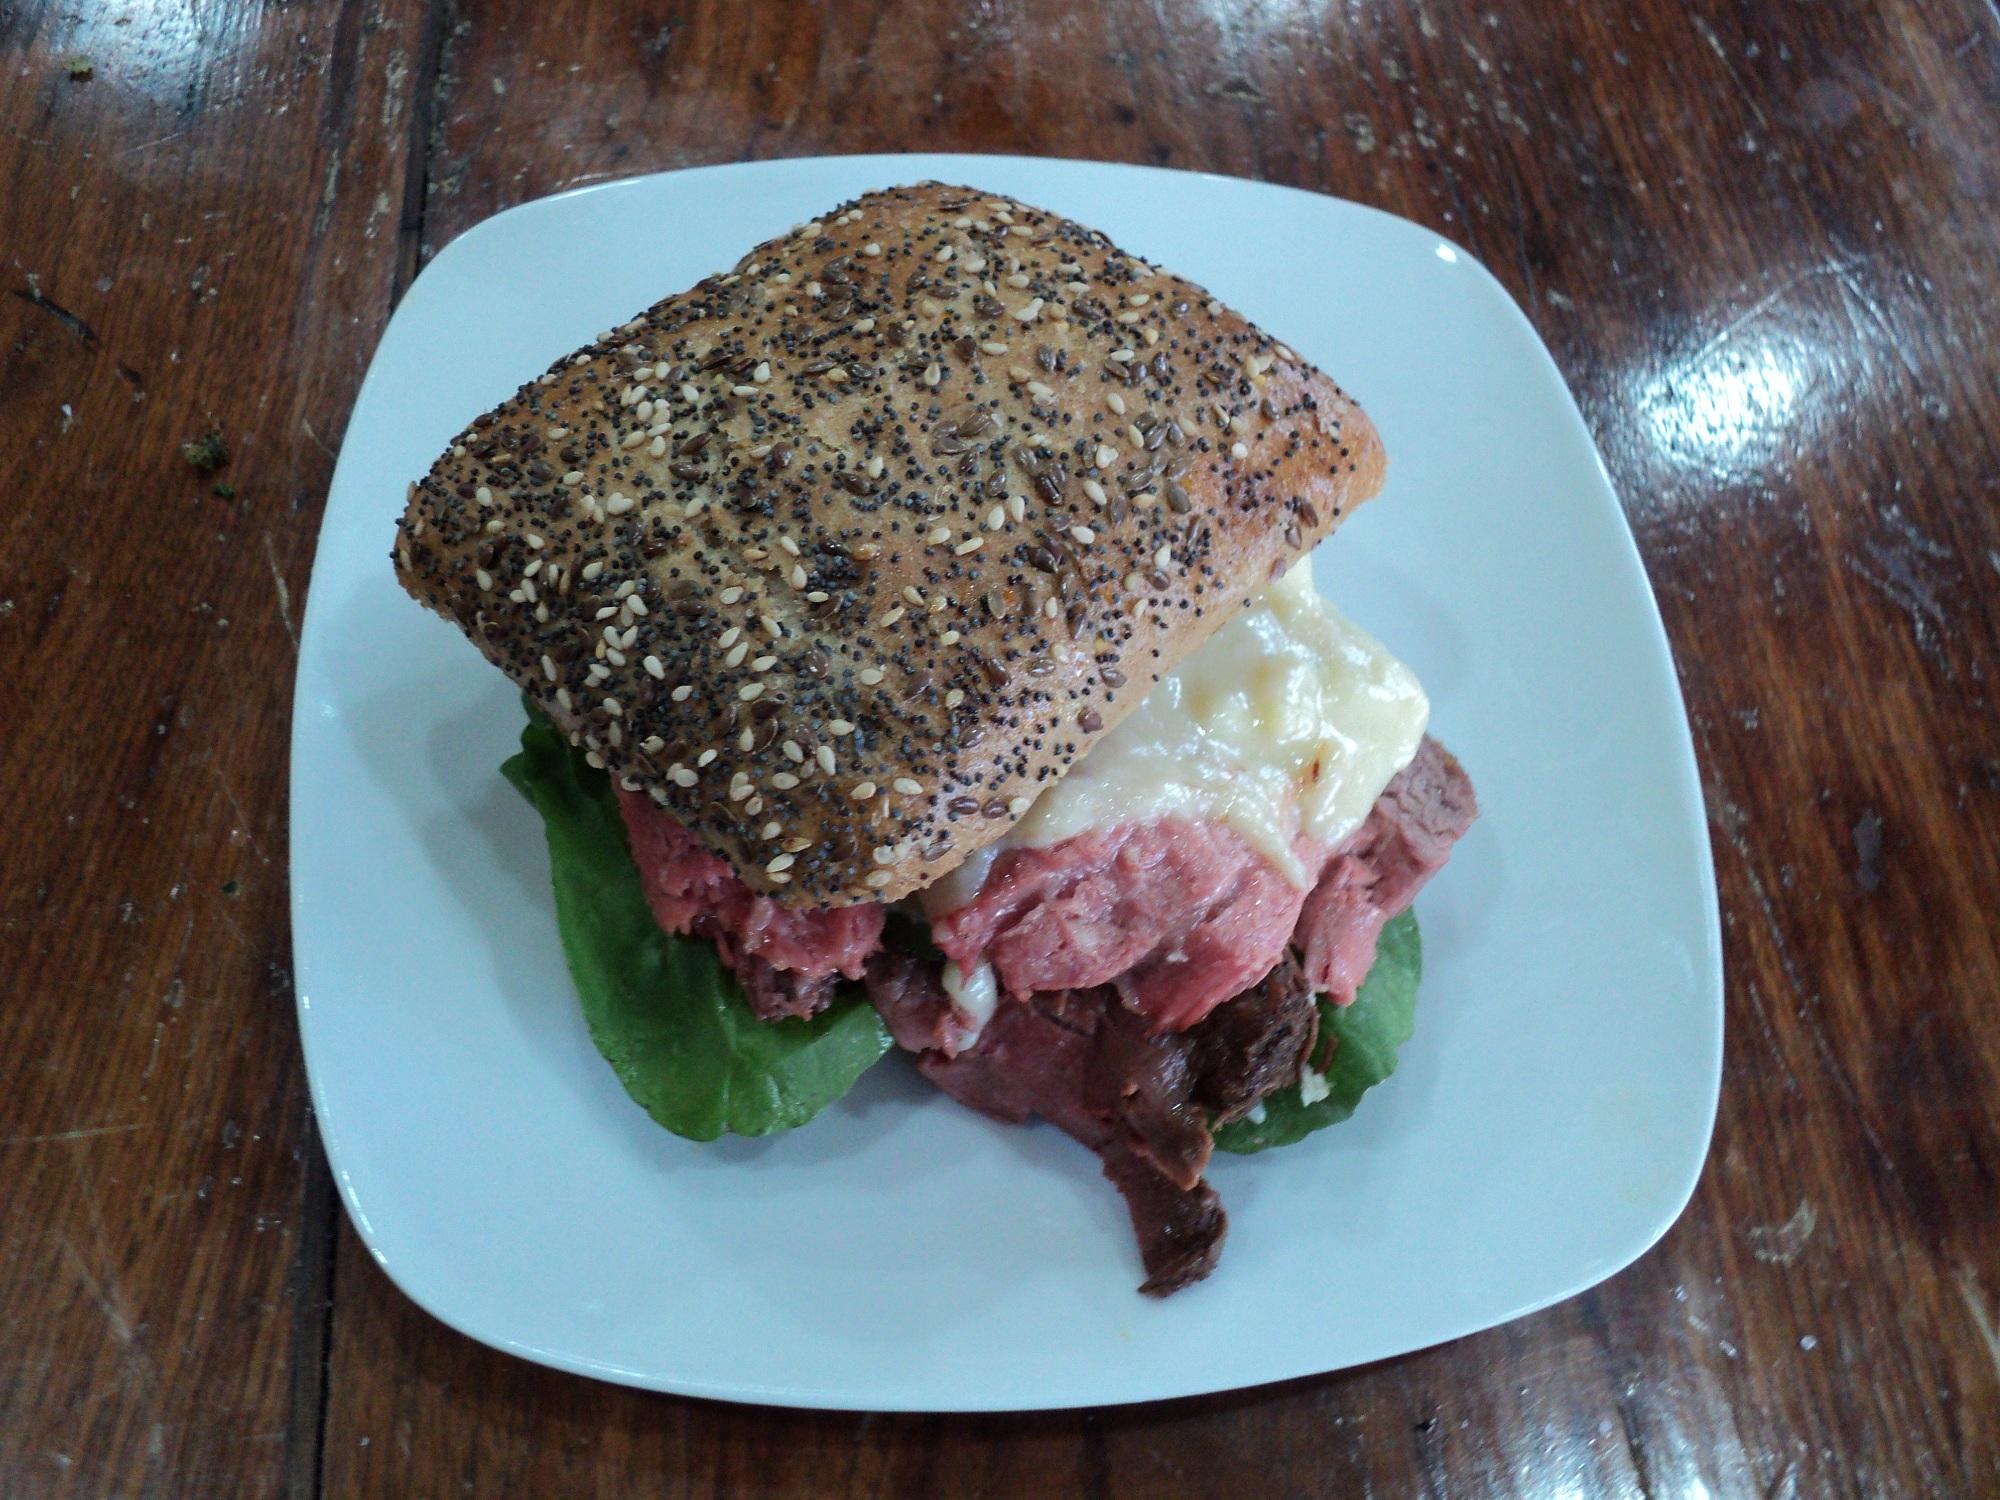 Rare Roast Beef Sandwich with Horseradish Fontina Fondue